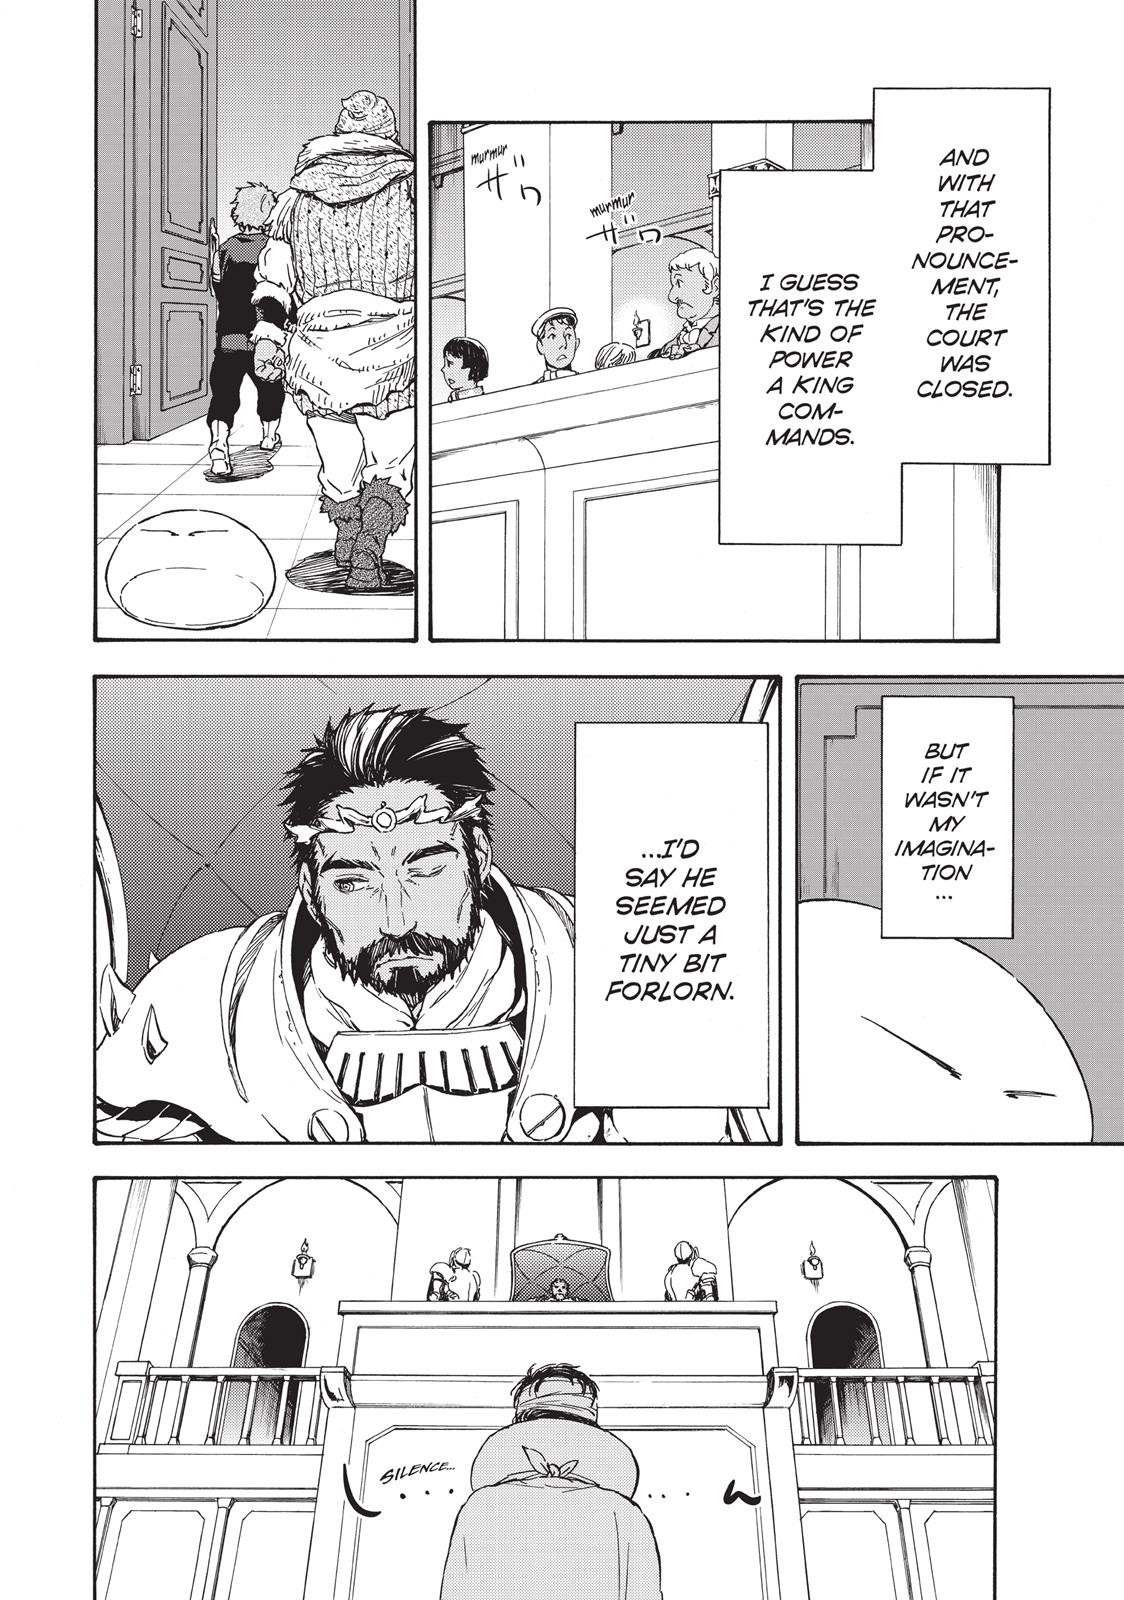 Tensei shitara Slime Datta Ken, Chapter 7 image 016